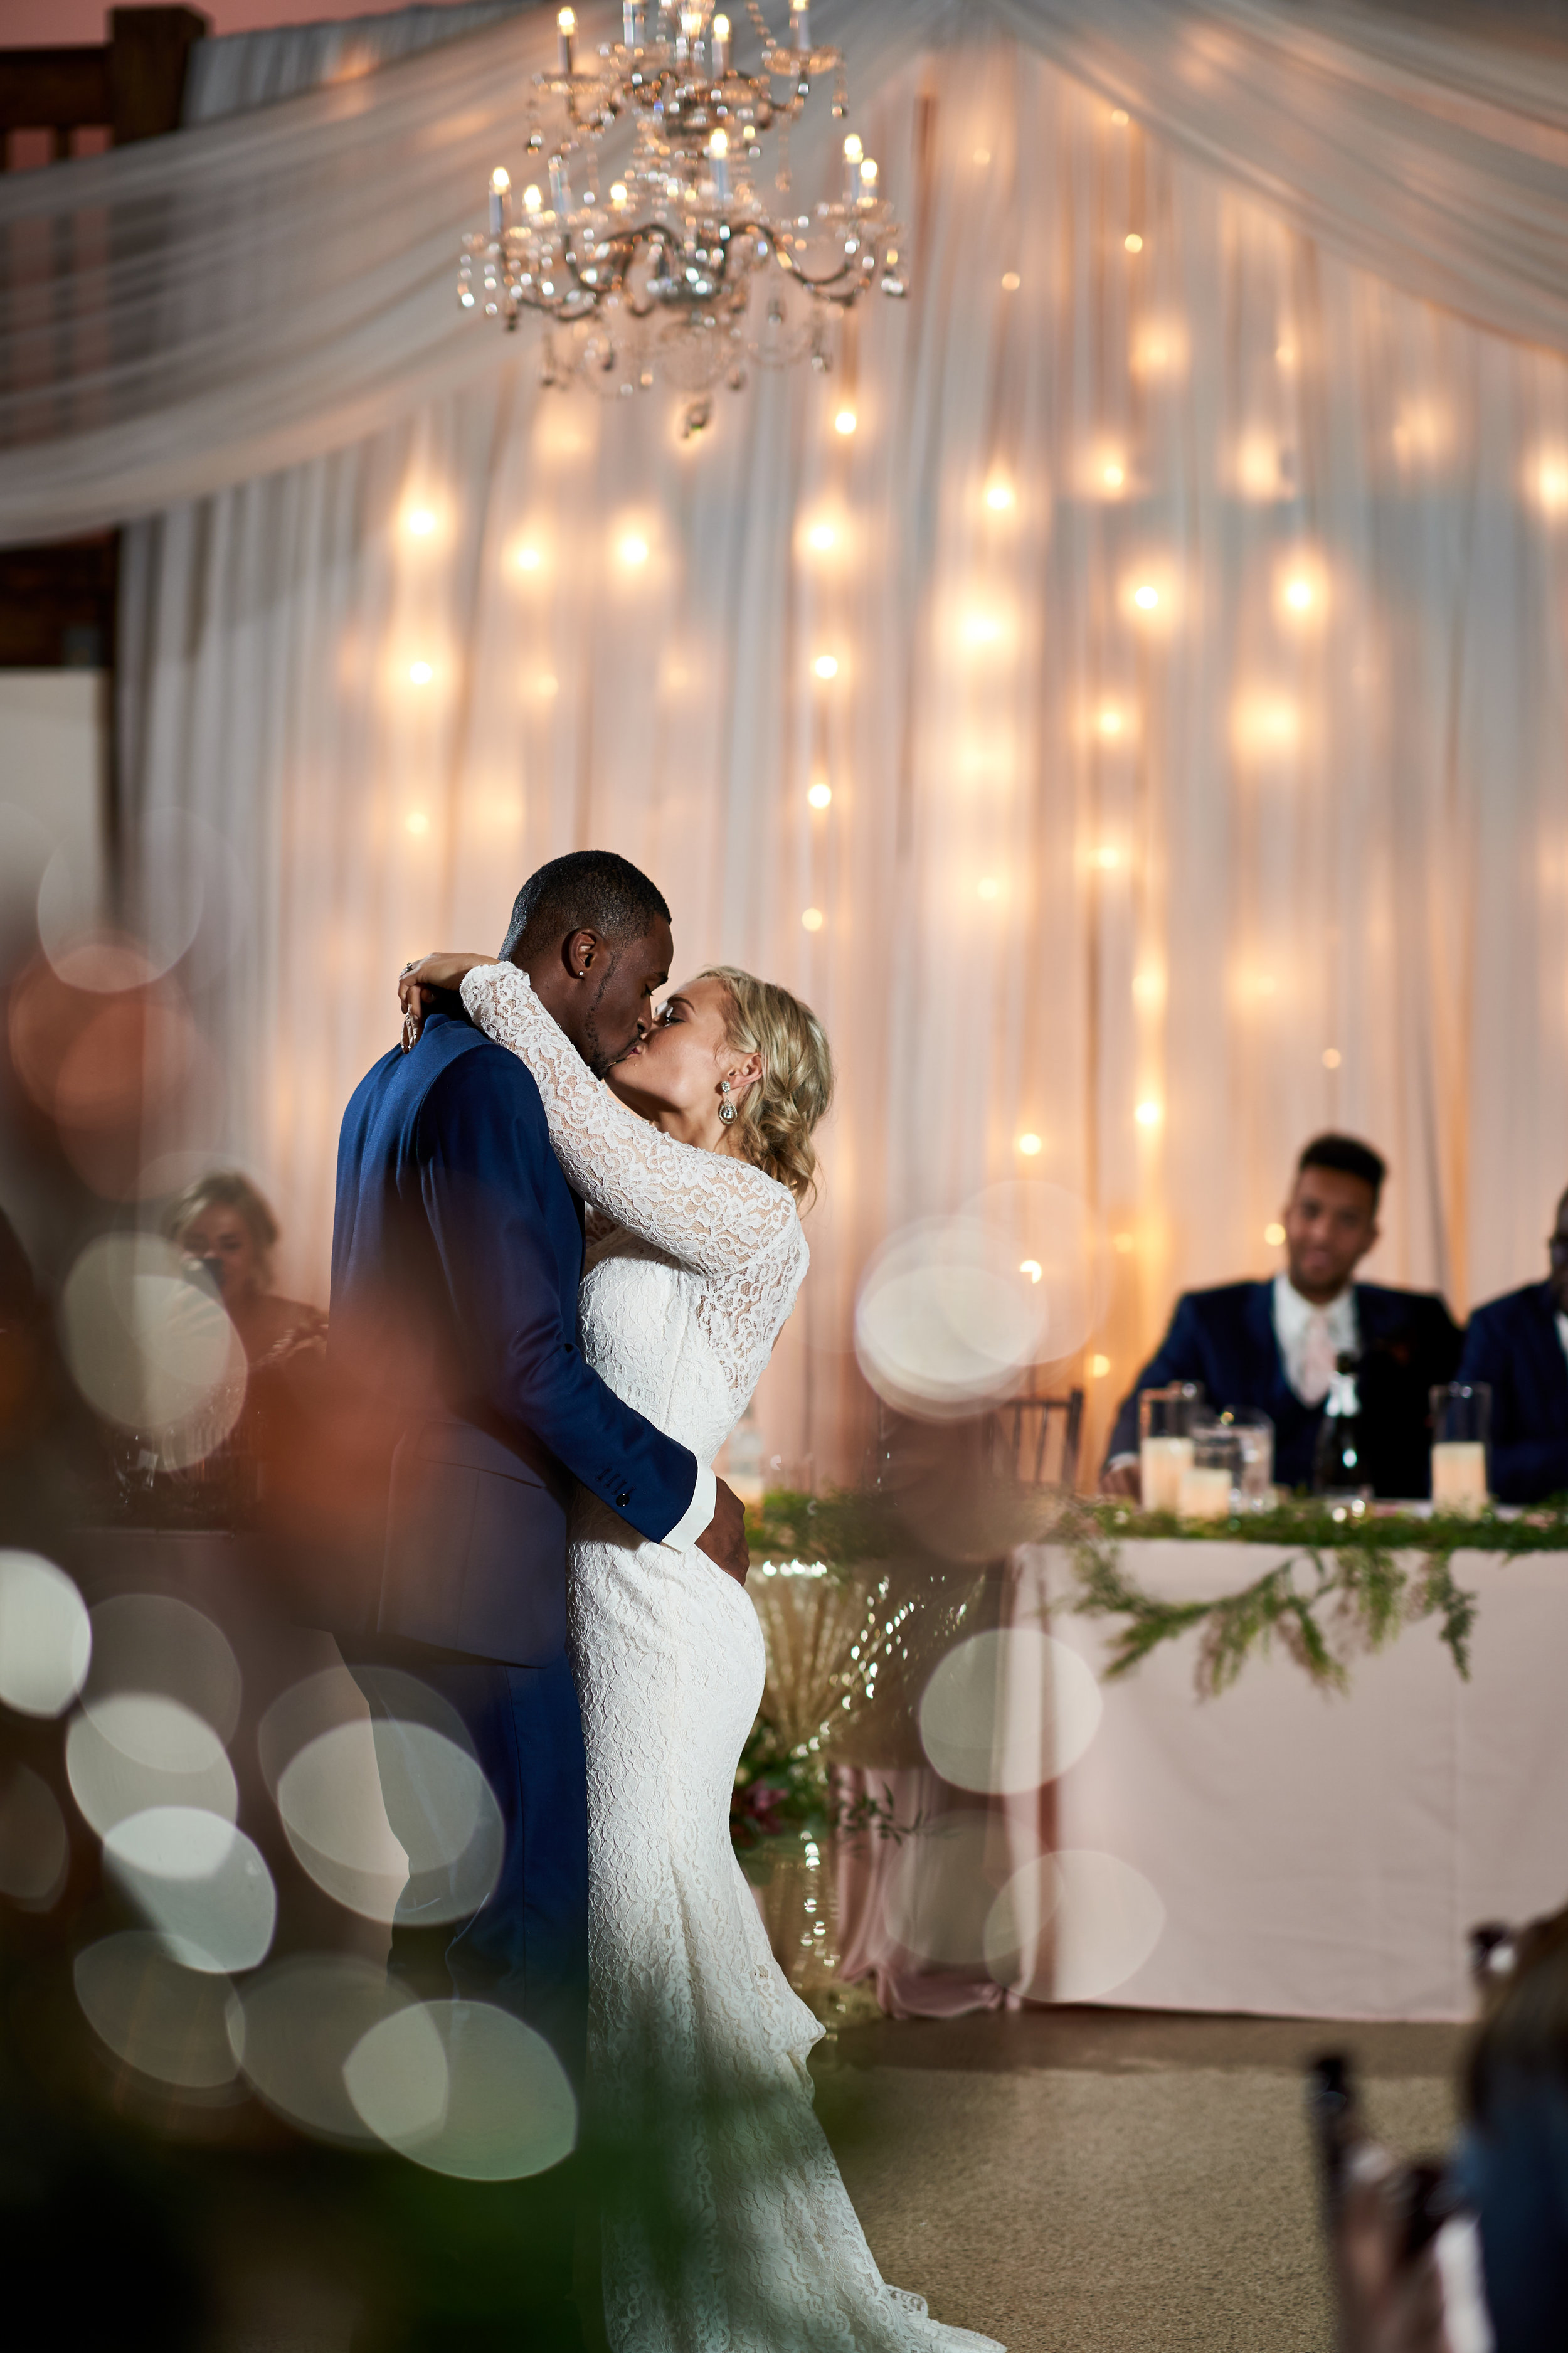 Véronique & Yannick's Wedding - 1143.jpg